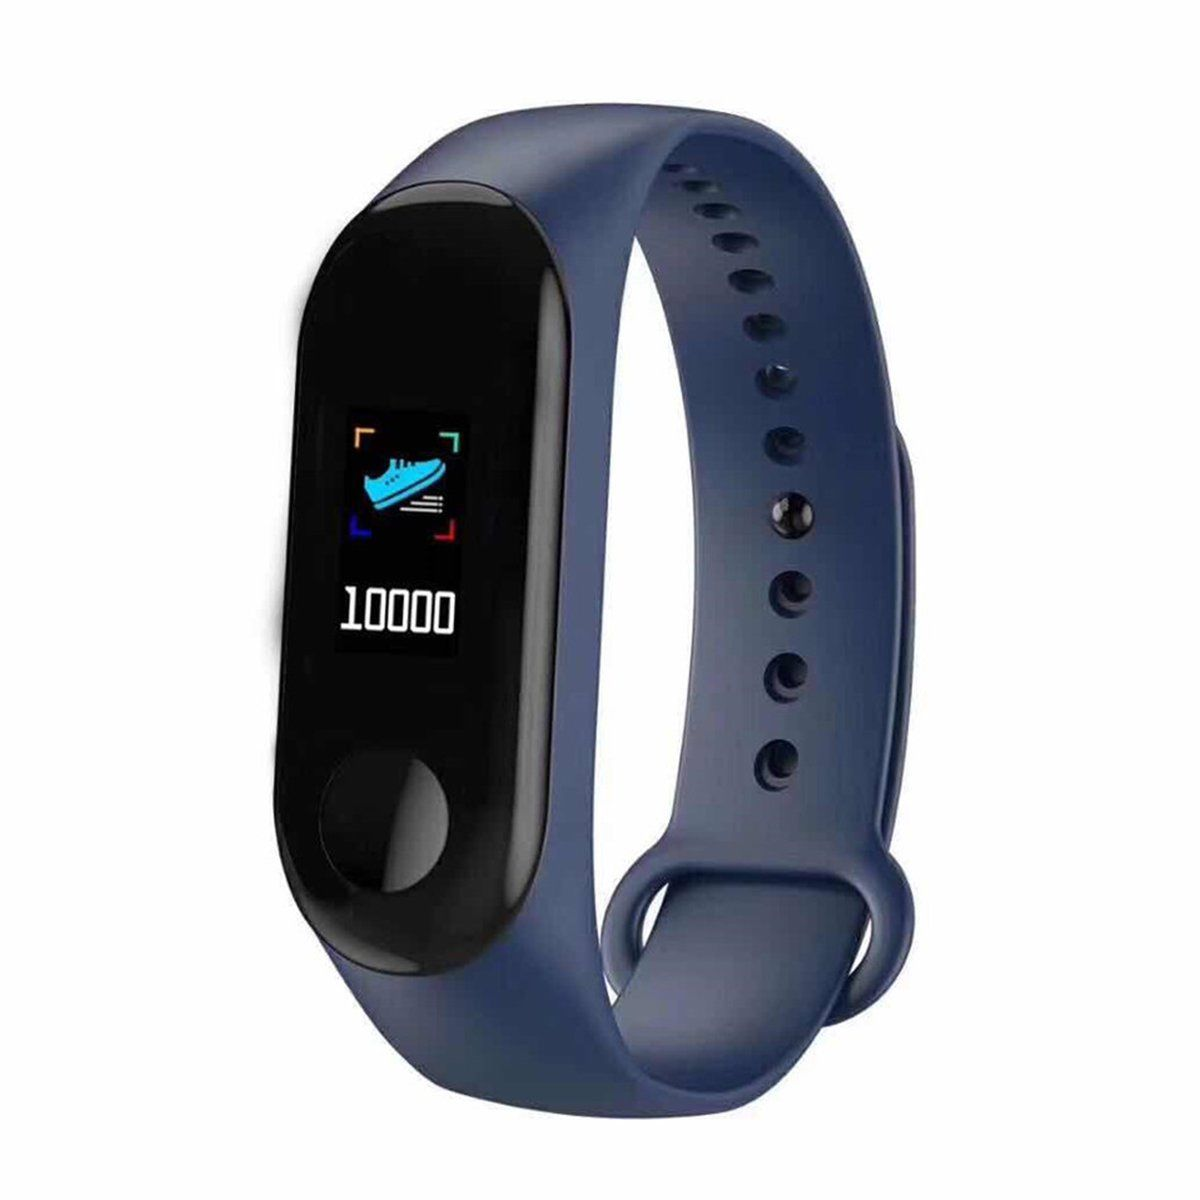 Smart Band Watch Bracelet Wristband Fitness Tracker Blood Pressure Heart RateSmart Band Watch Bracelet Wristband Fitness Tracker Blood Pressure Heart Rate